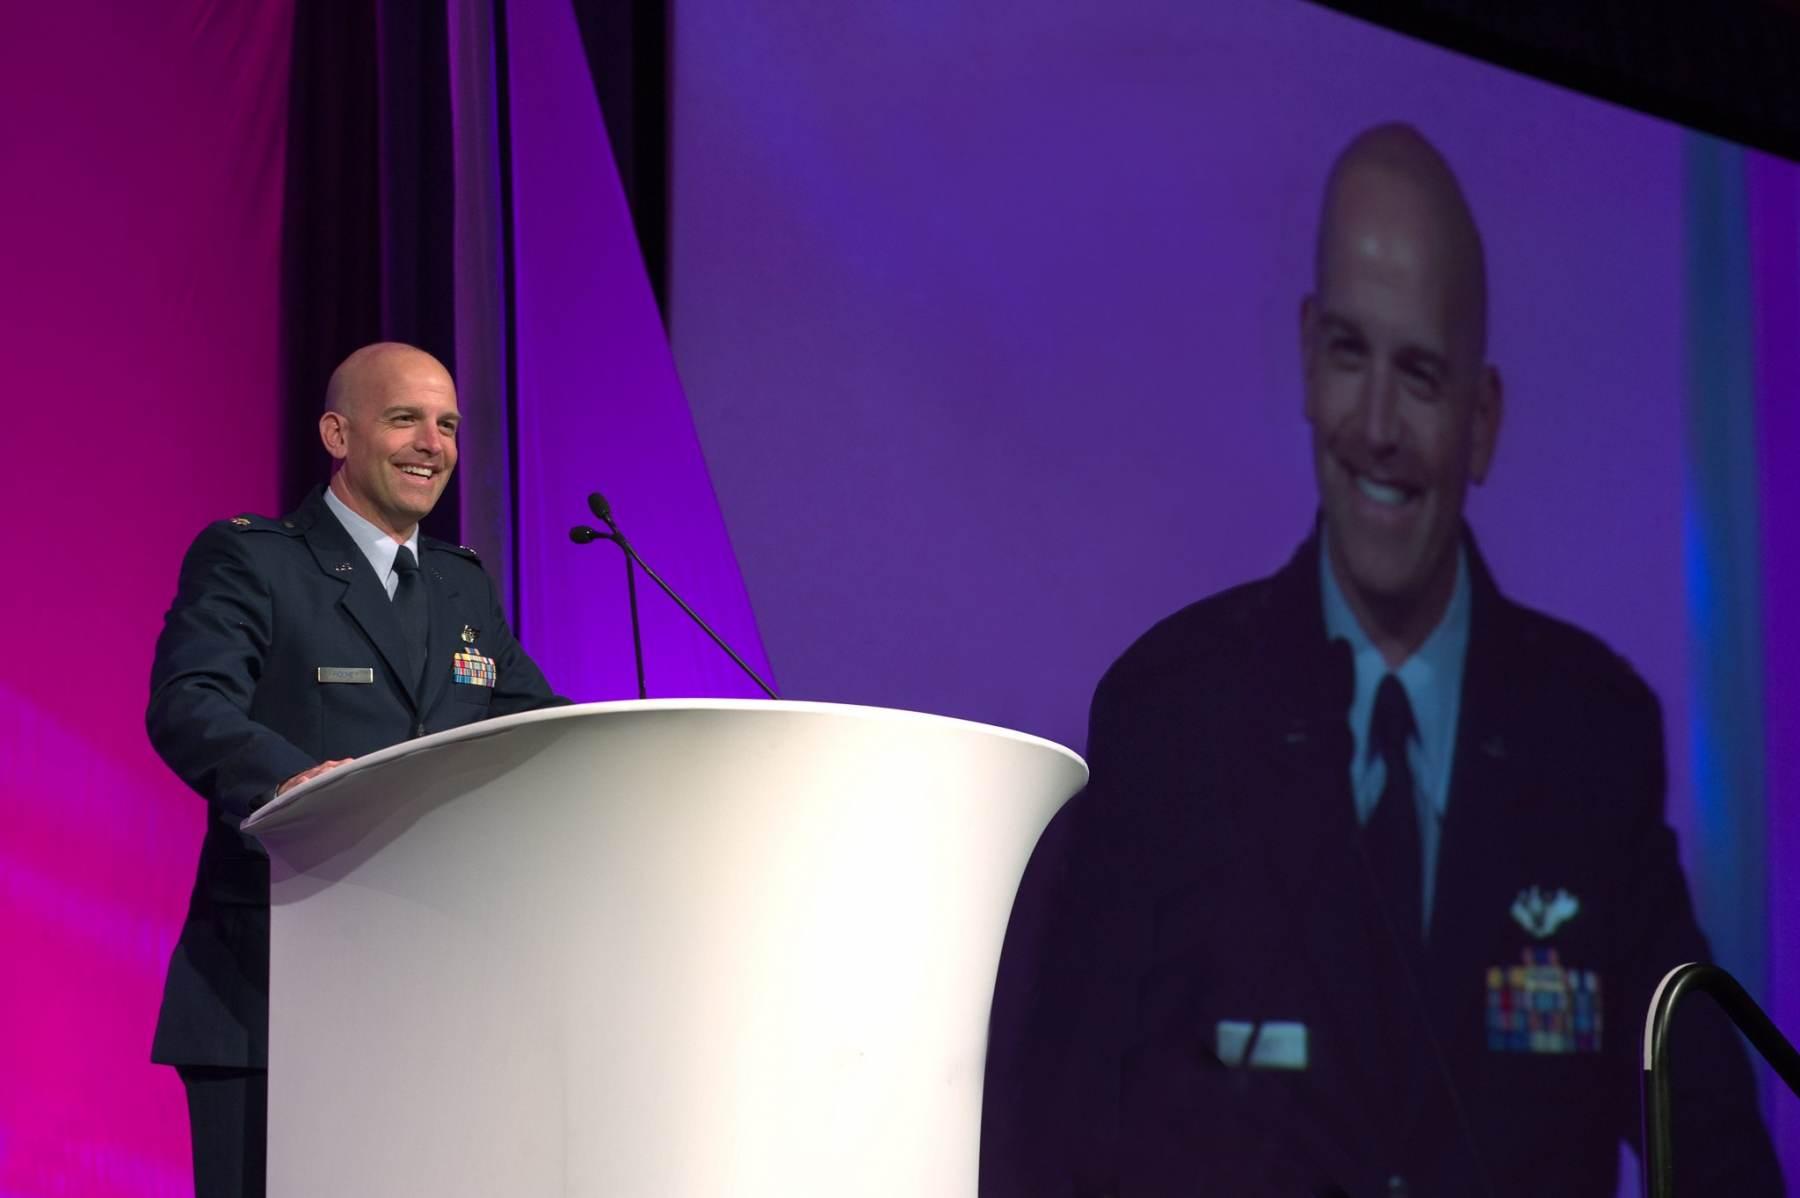 USAF Major Dan Rooney presents Folds of Honor